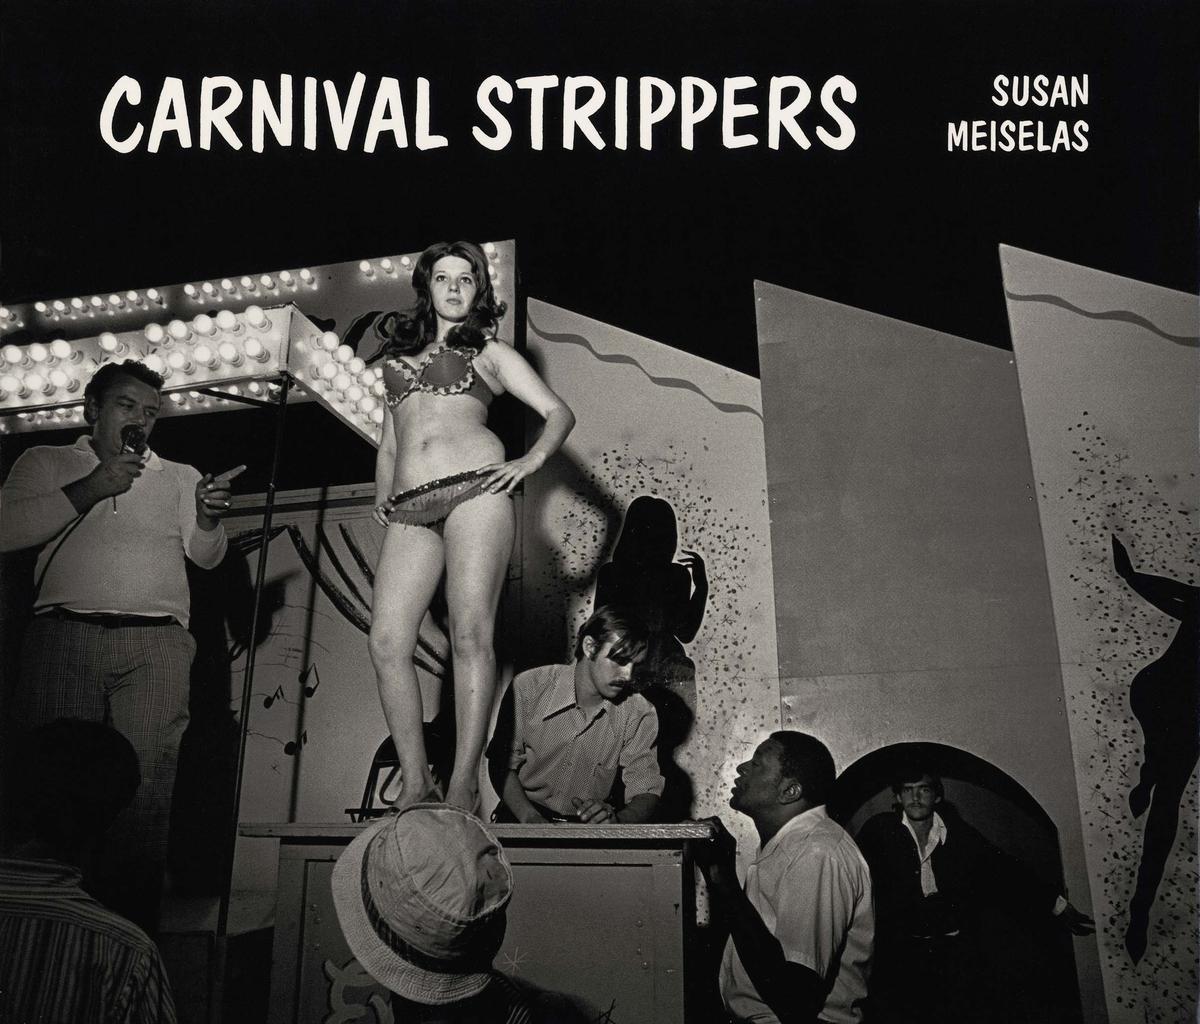 Susan Meiselas: Carnival Strippers<br />New York - Göttingen. Whitney Museum of American Art - Steidl Publishers<br />2003